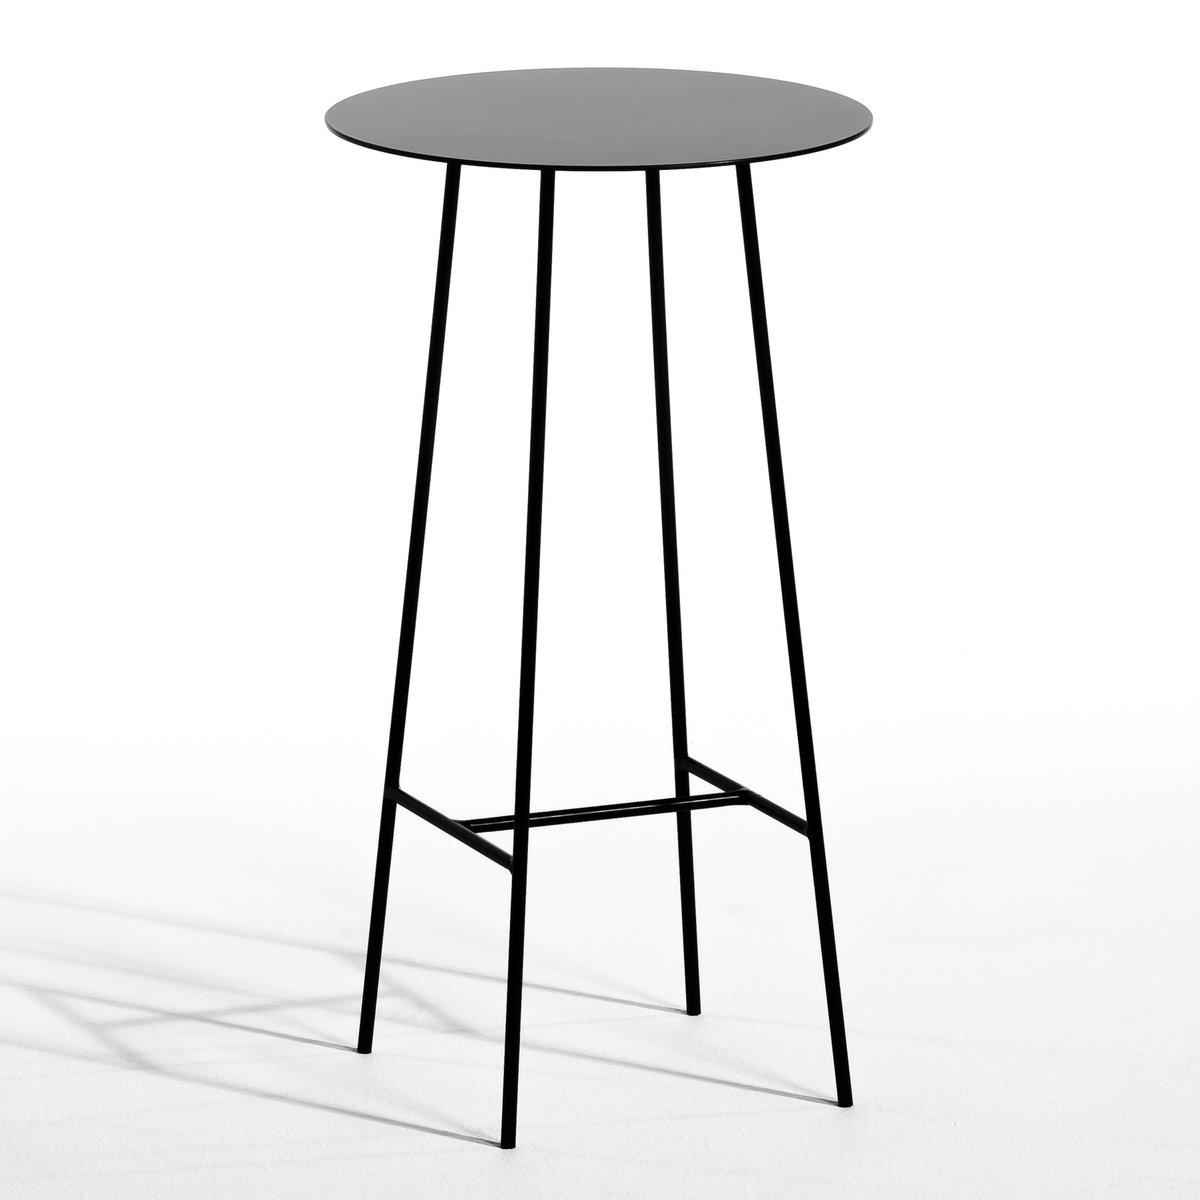 Tavolino design E. Gallina, Gemma